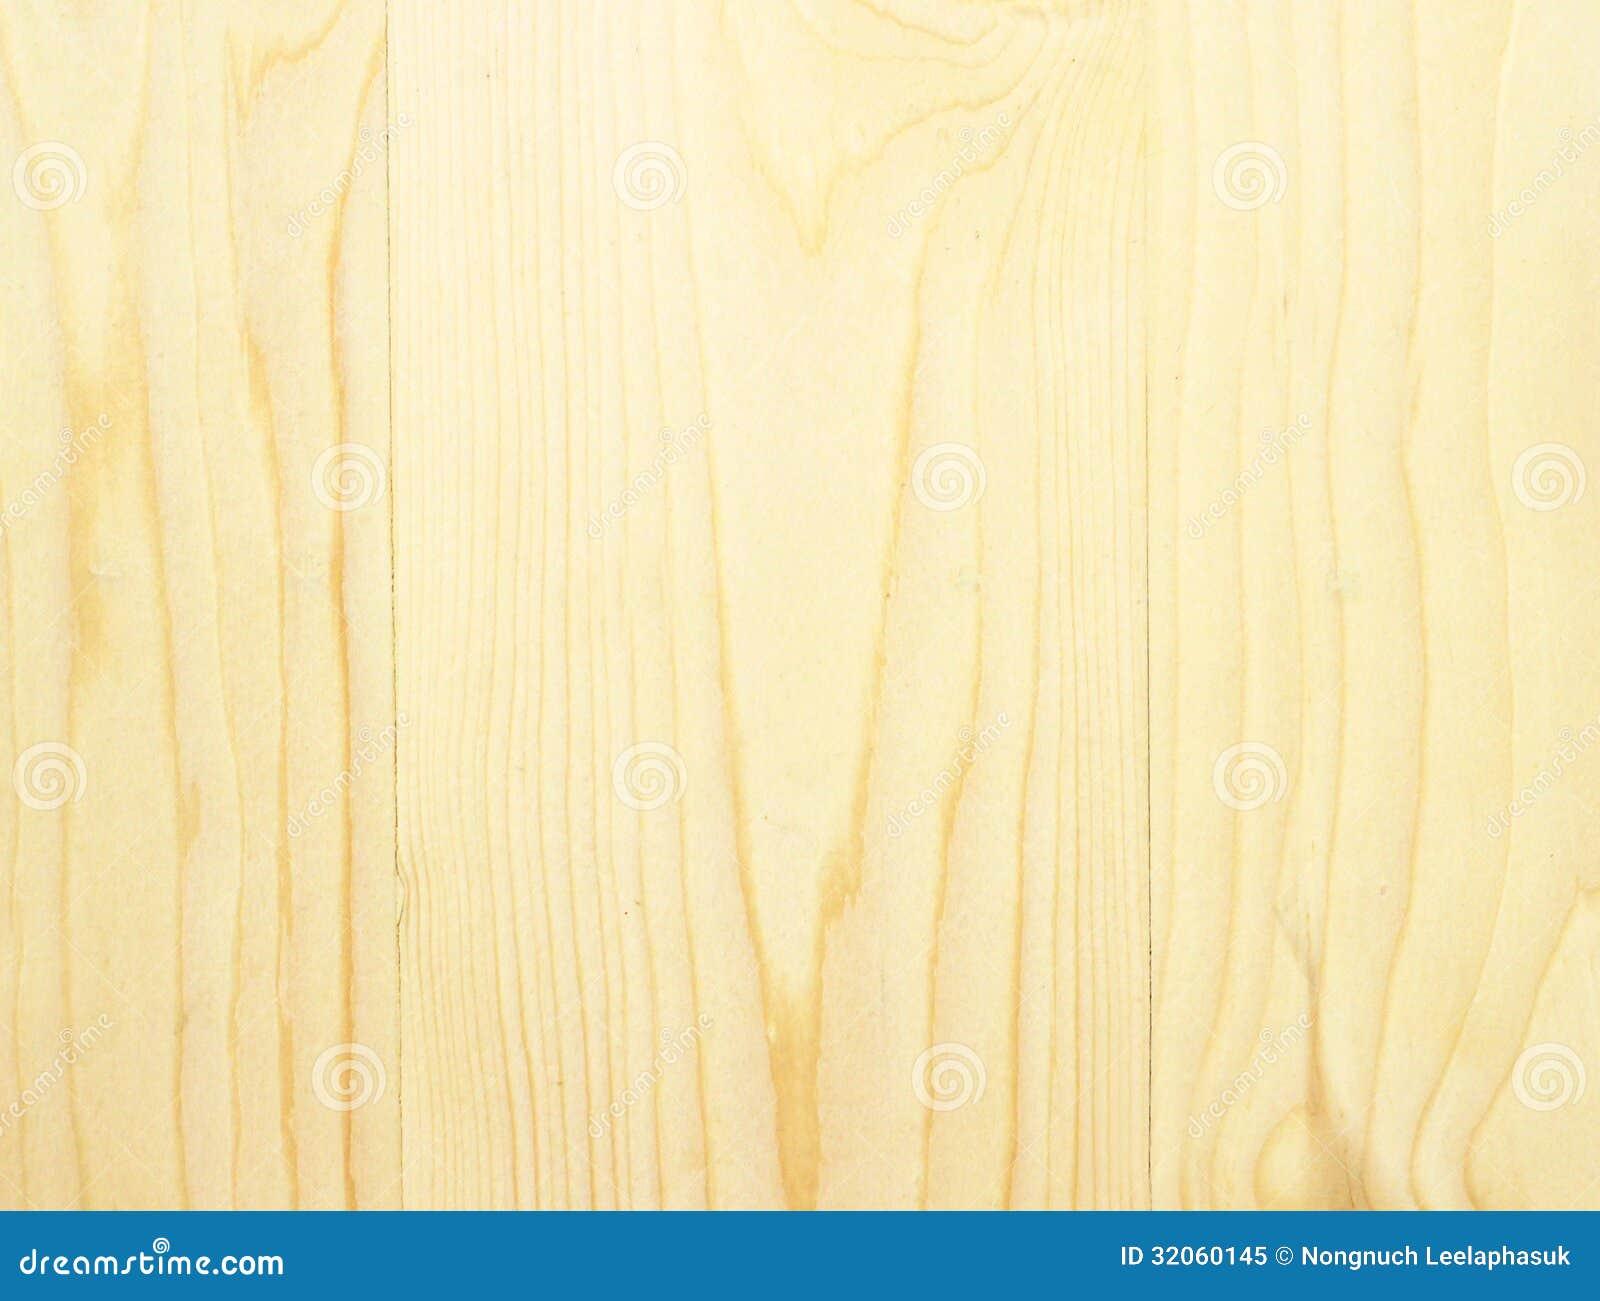 Light Wood Brown Texture